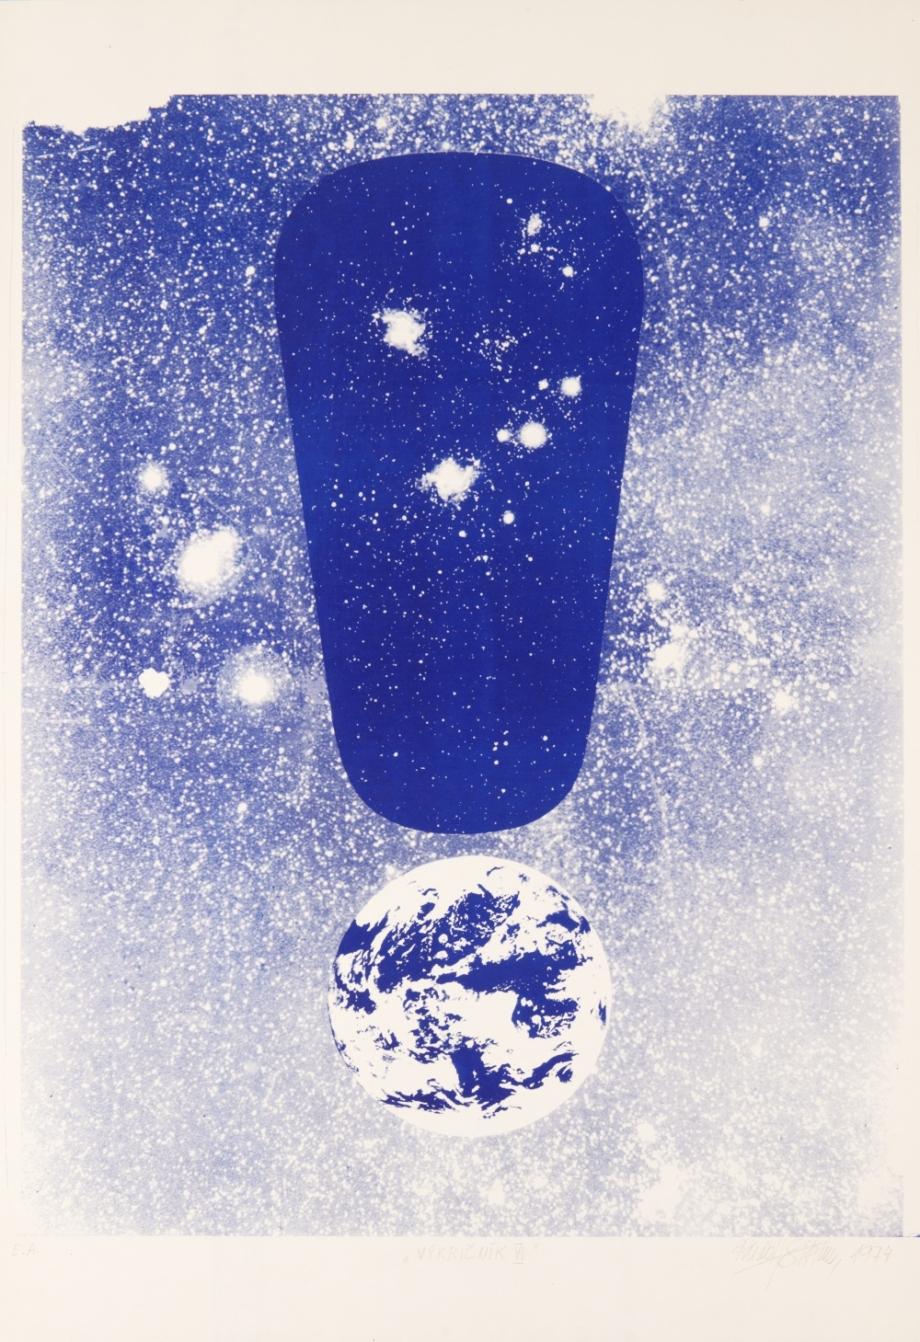 Rudolf Sikora, Vykřičník VI., 1974, serigrafie, papír, 69,7×46,5 cm